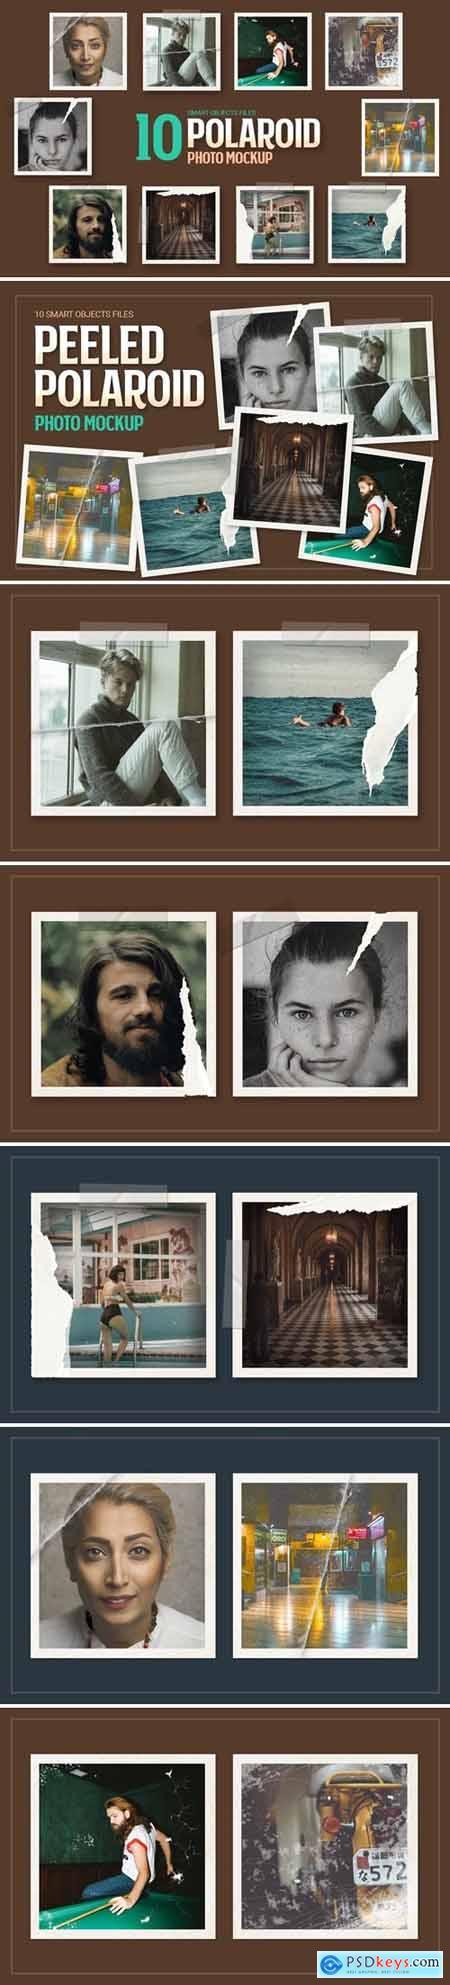 Peeled Polaroid Photo Frame Mockup